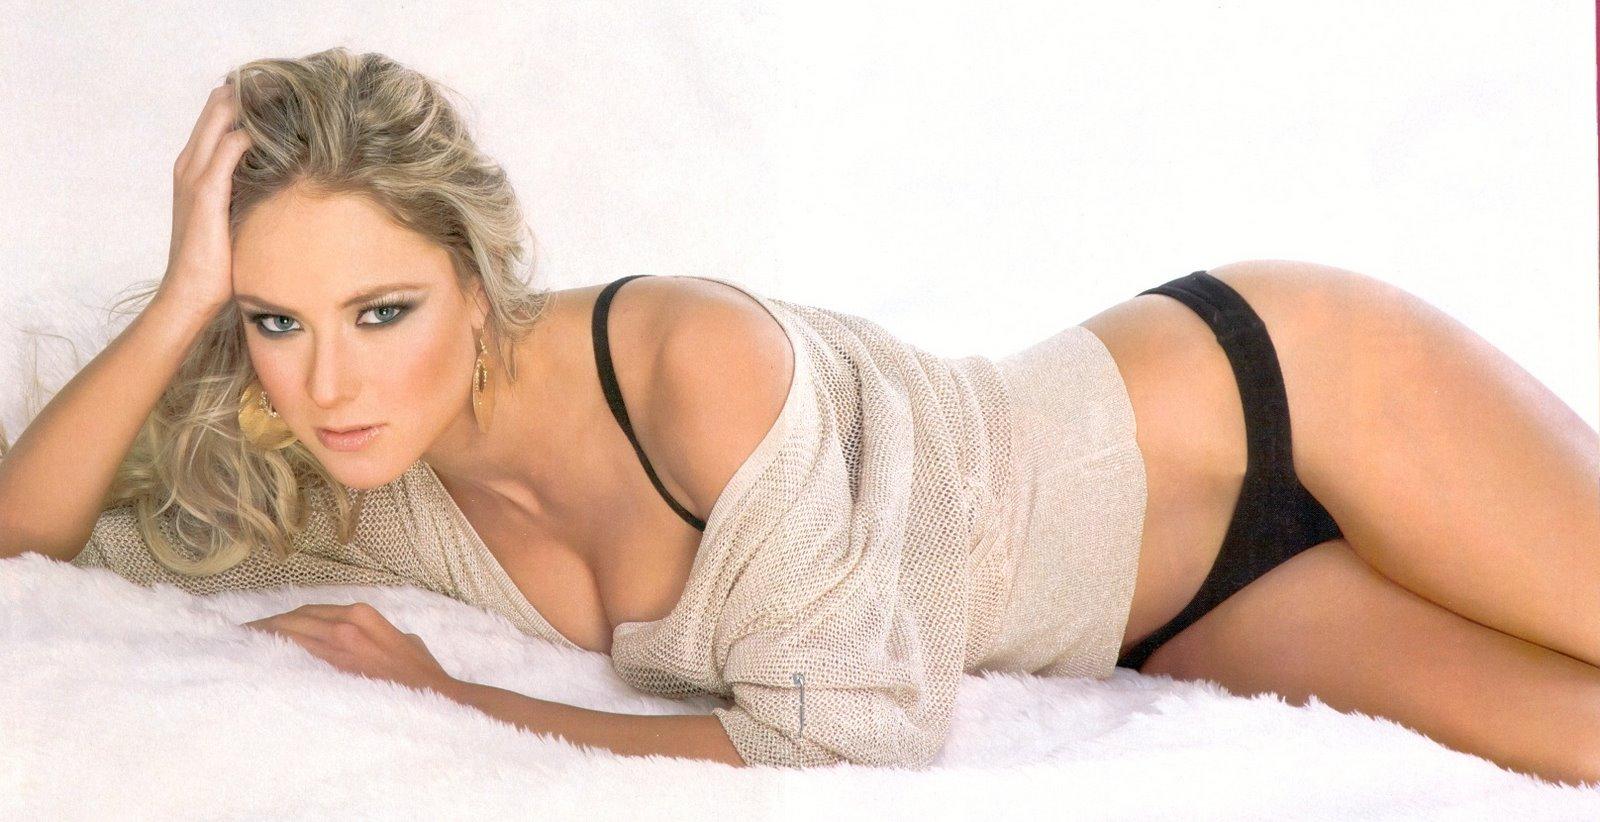 Hottest espn female sportscasters sex porn images for Daniela villa modelo